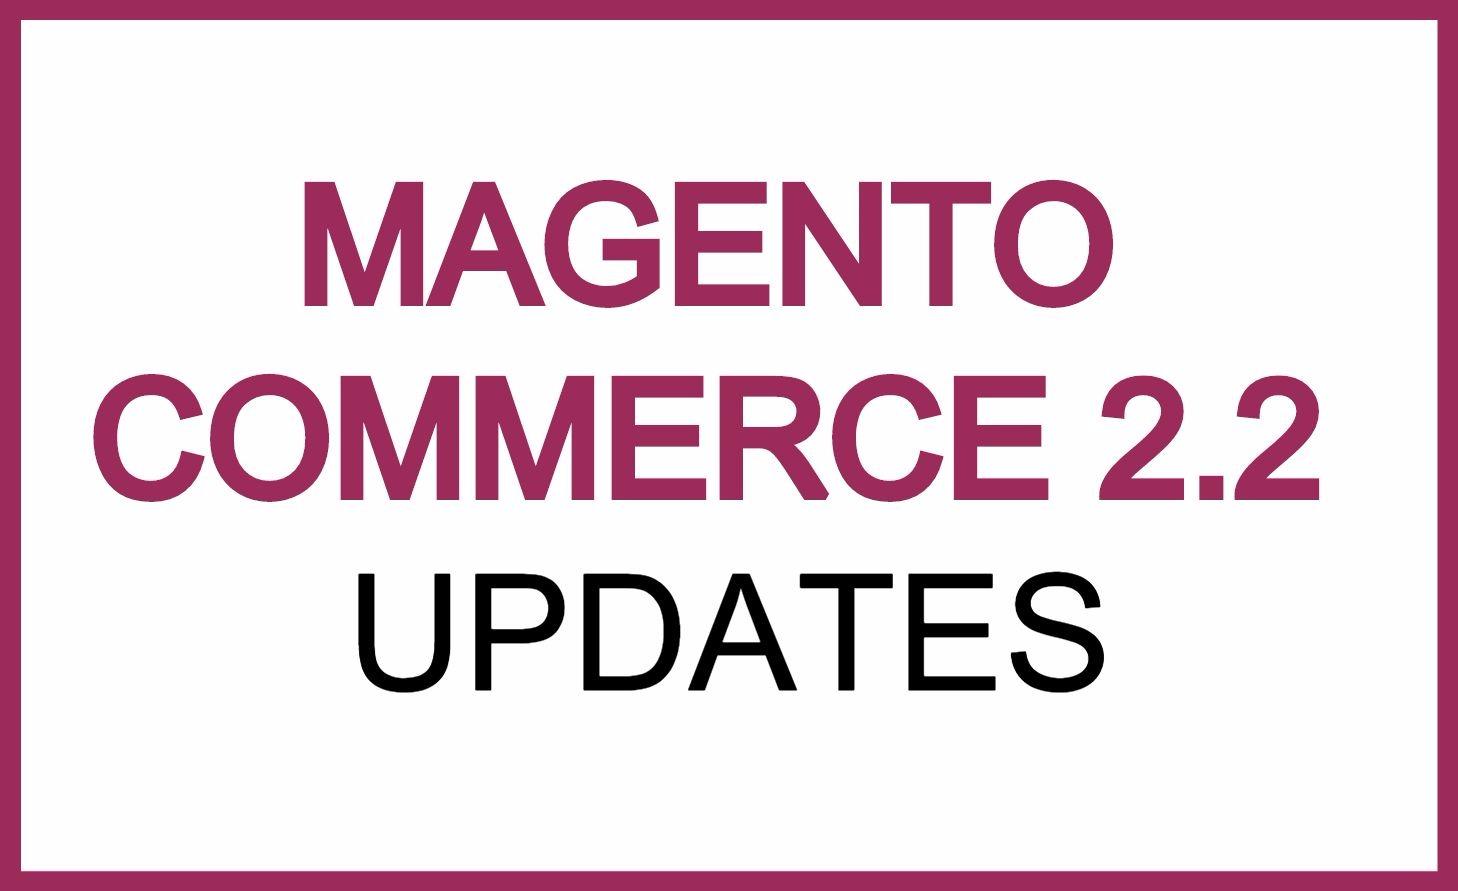 magento commerce 2_2.jpg